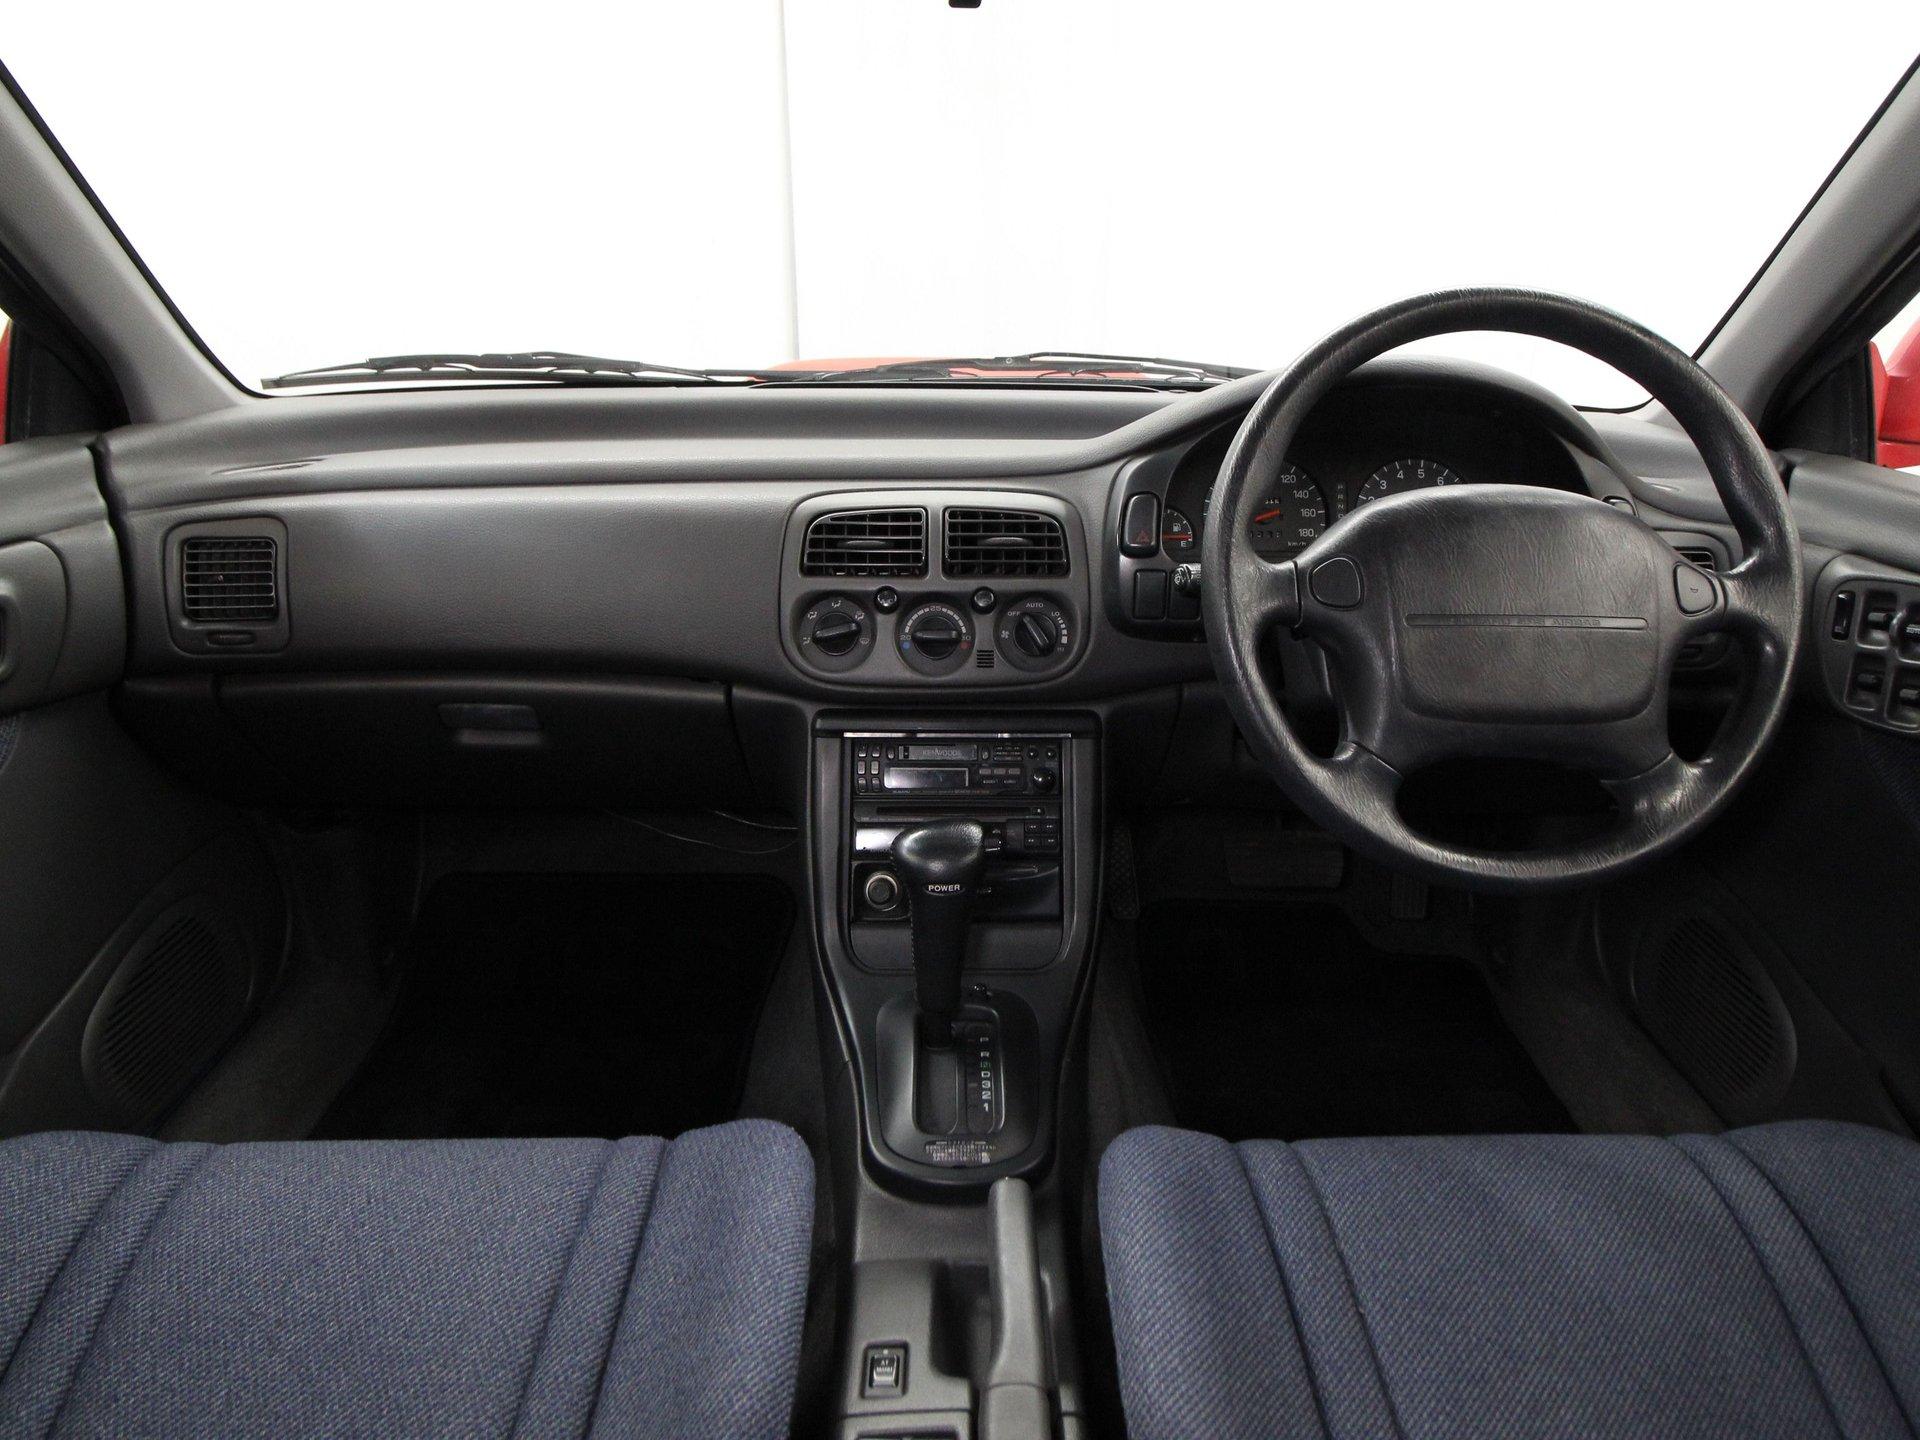 1996 Subaru Impreza WRX